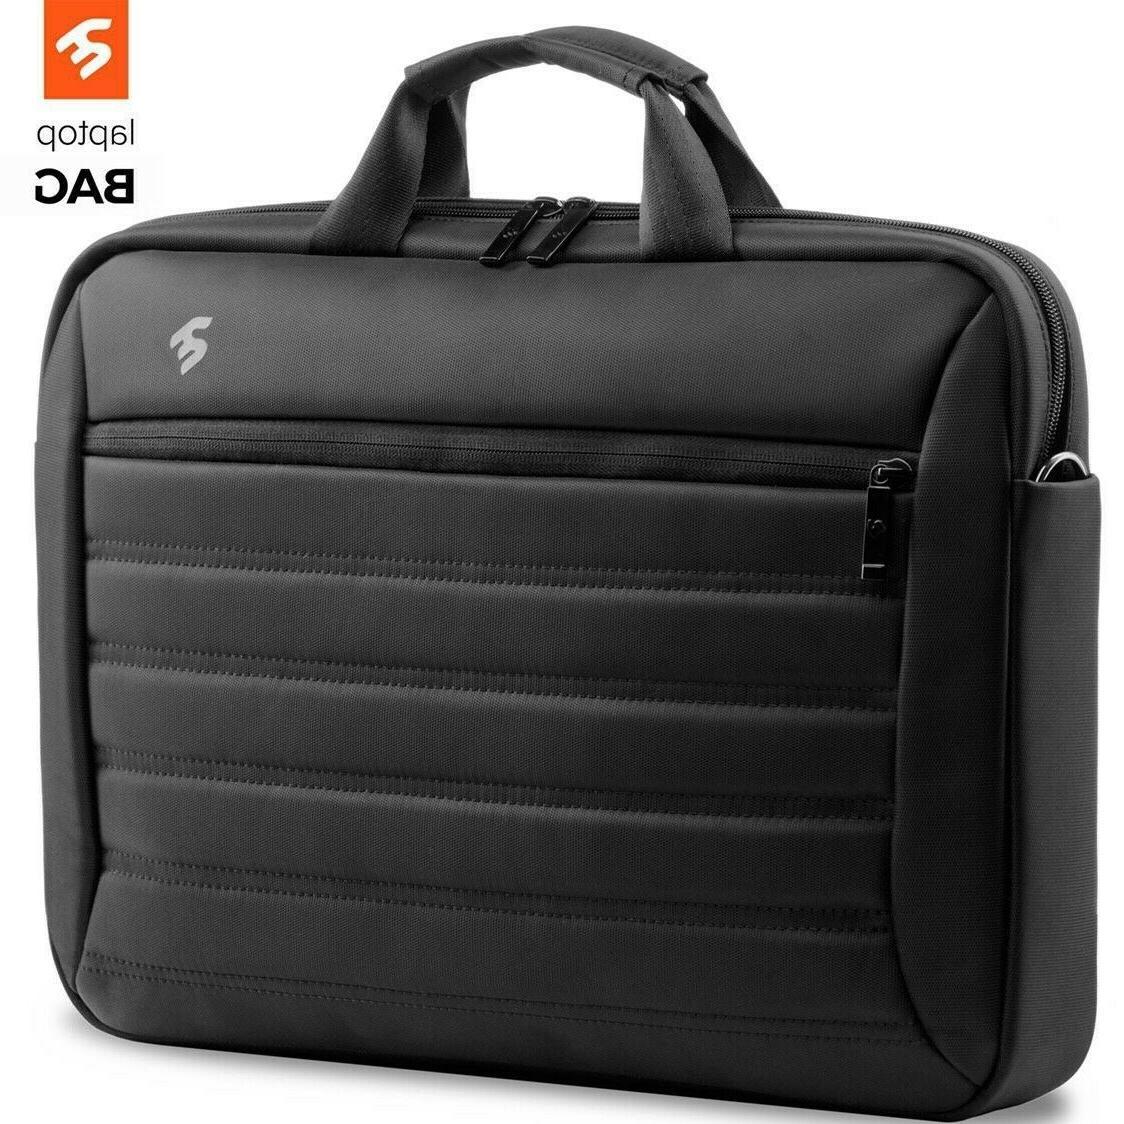 Premium Laptop / Bag 11''-15.6 '' Case Man Woman ON SALE!